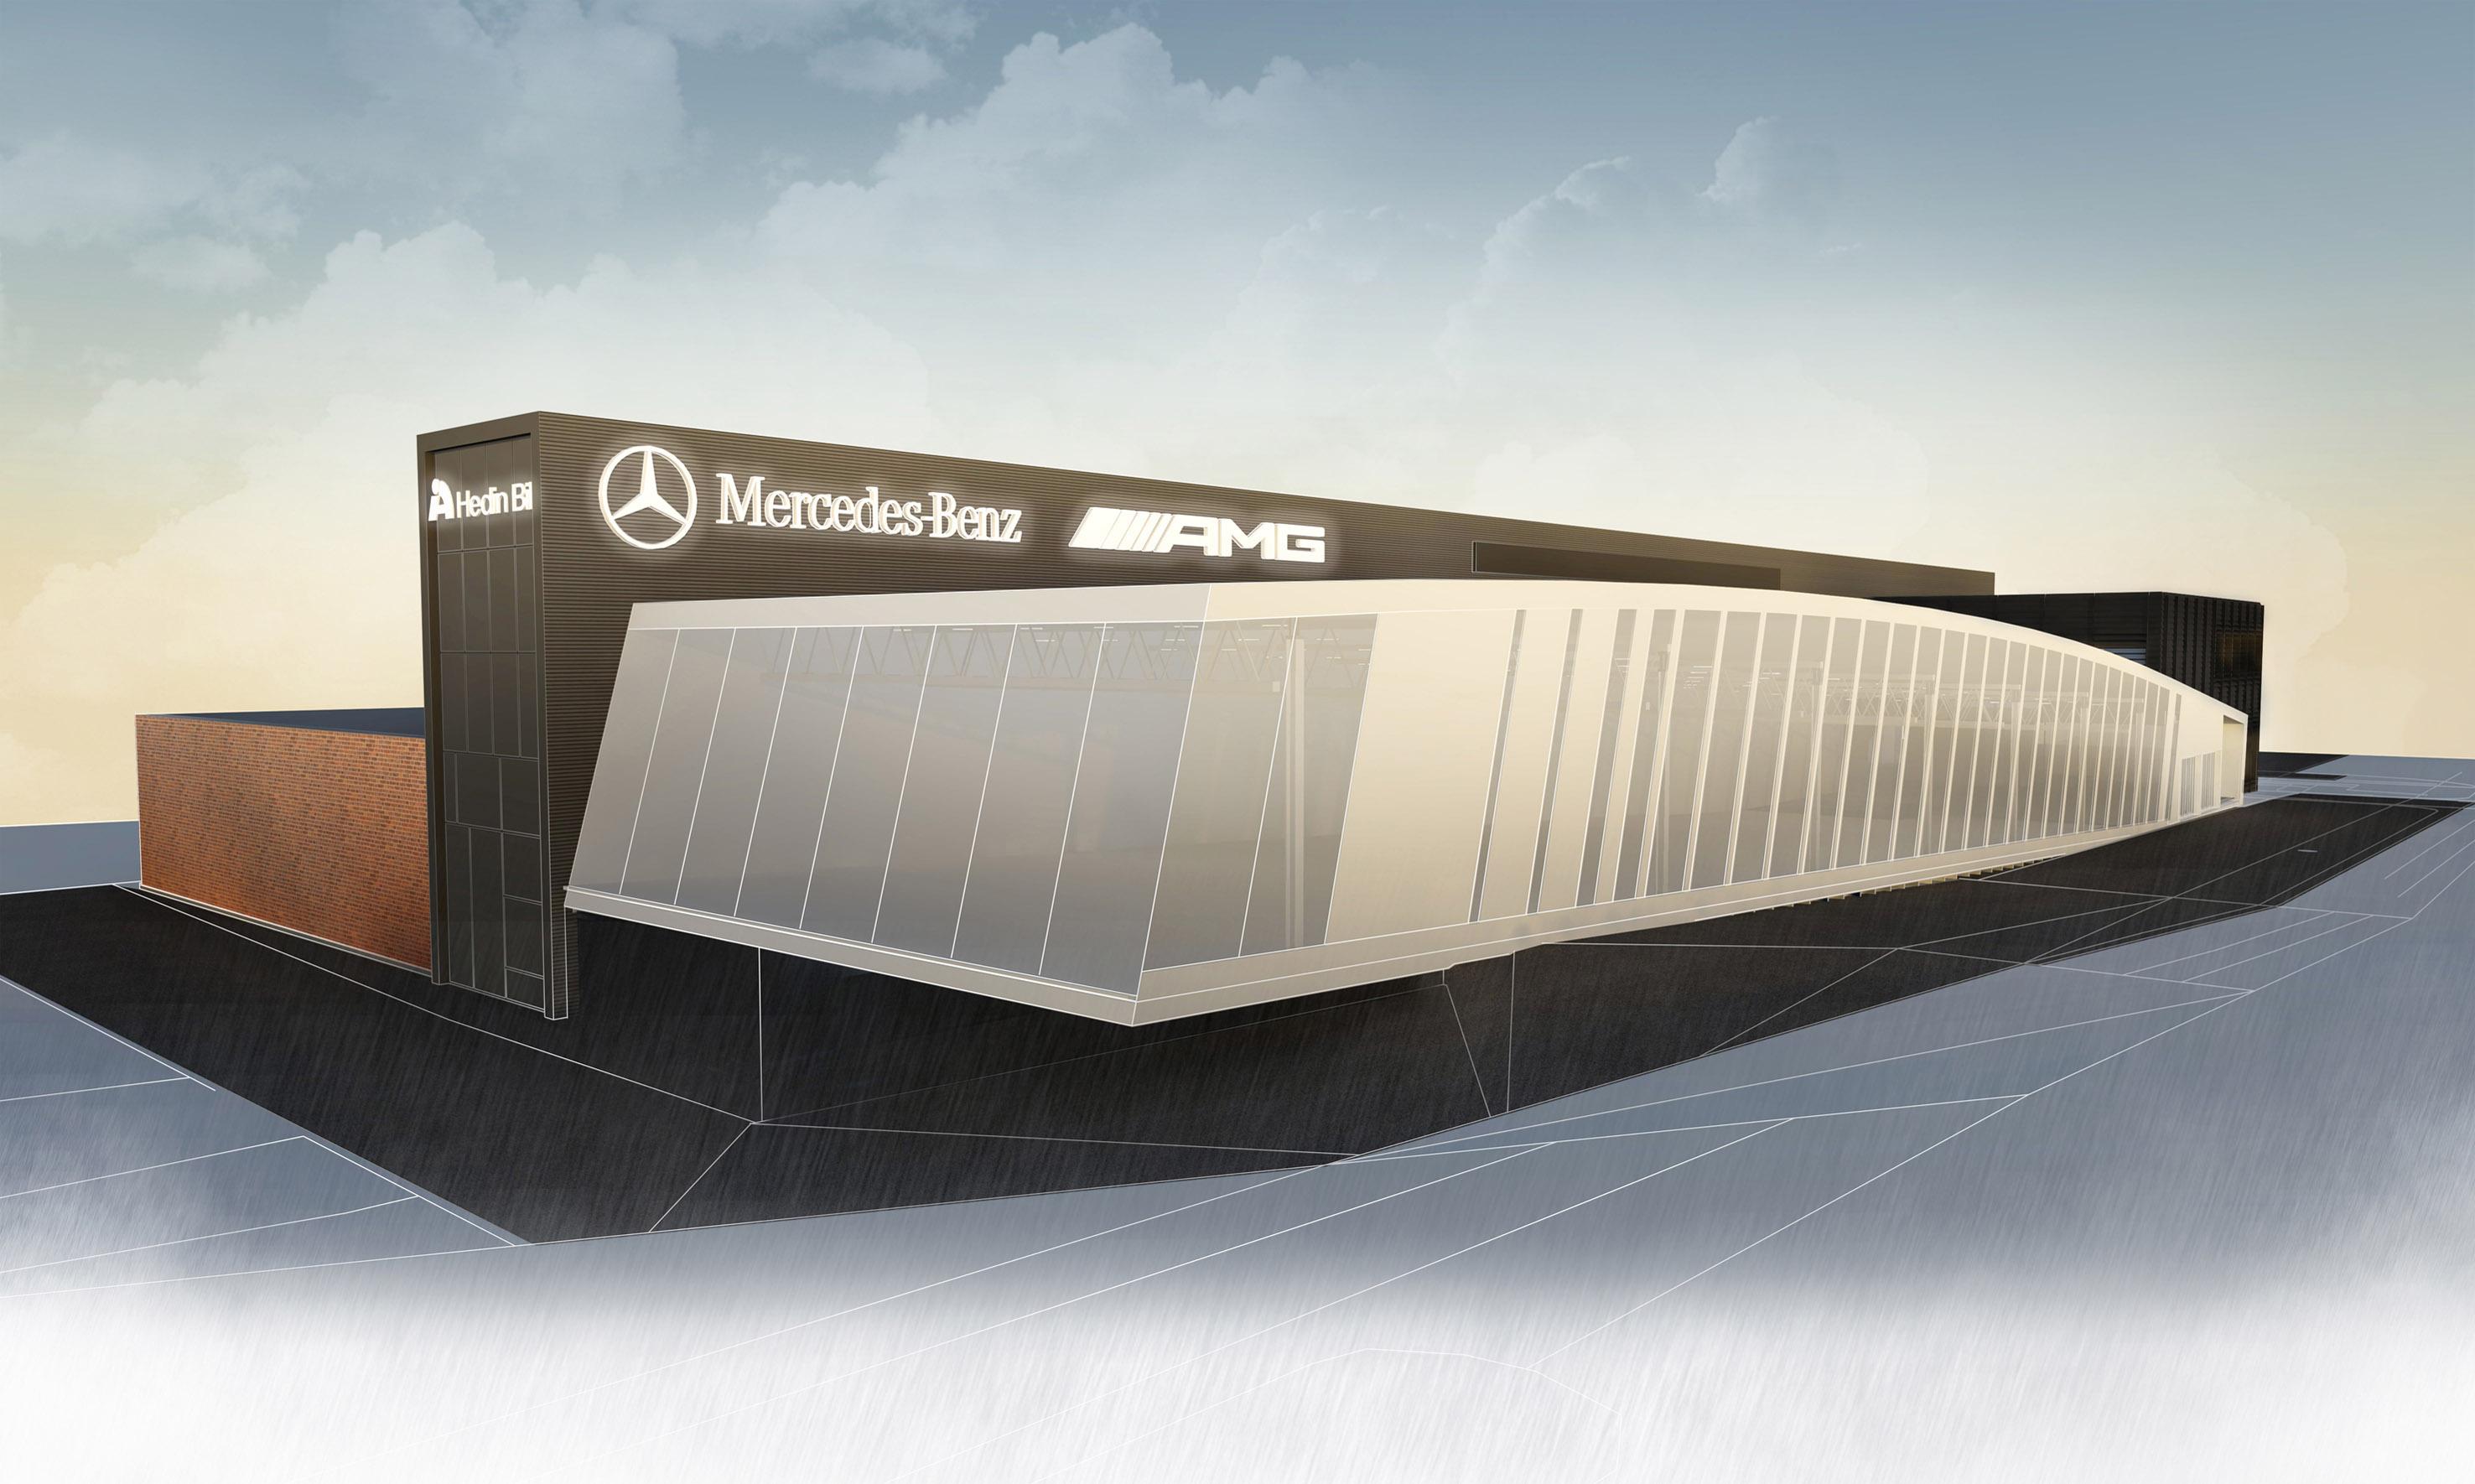 Hedin Bil AMG Center - Mercedes-Benz